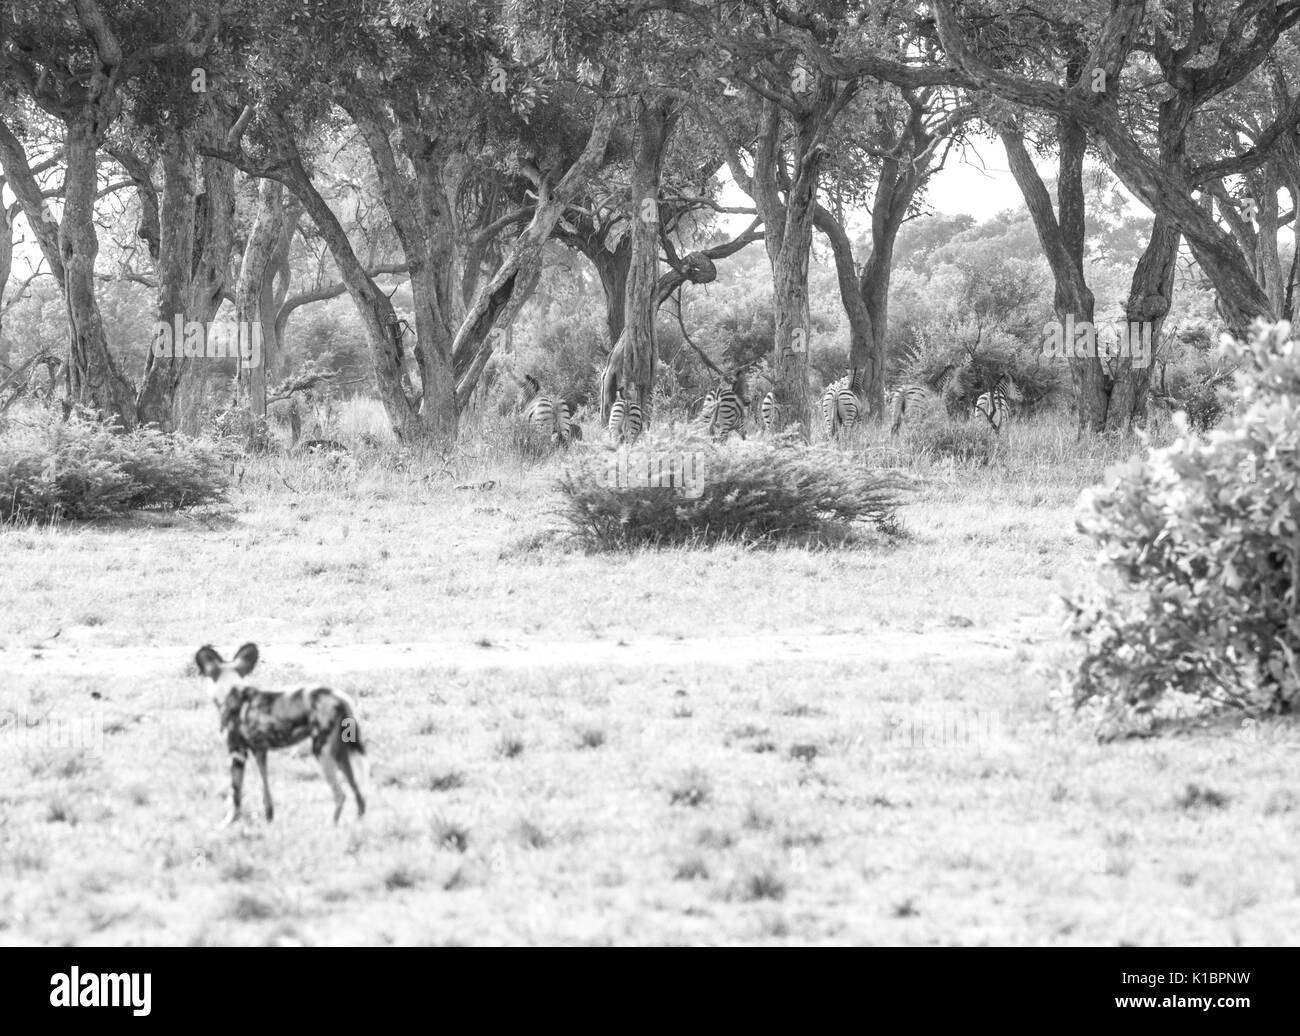 African Wild Dog (Lycaon pictus) - Stock Image